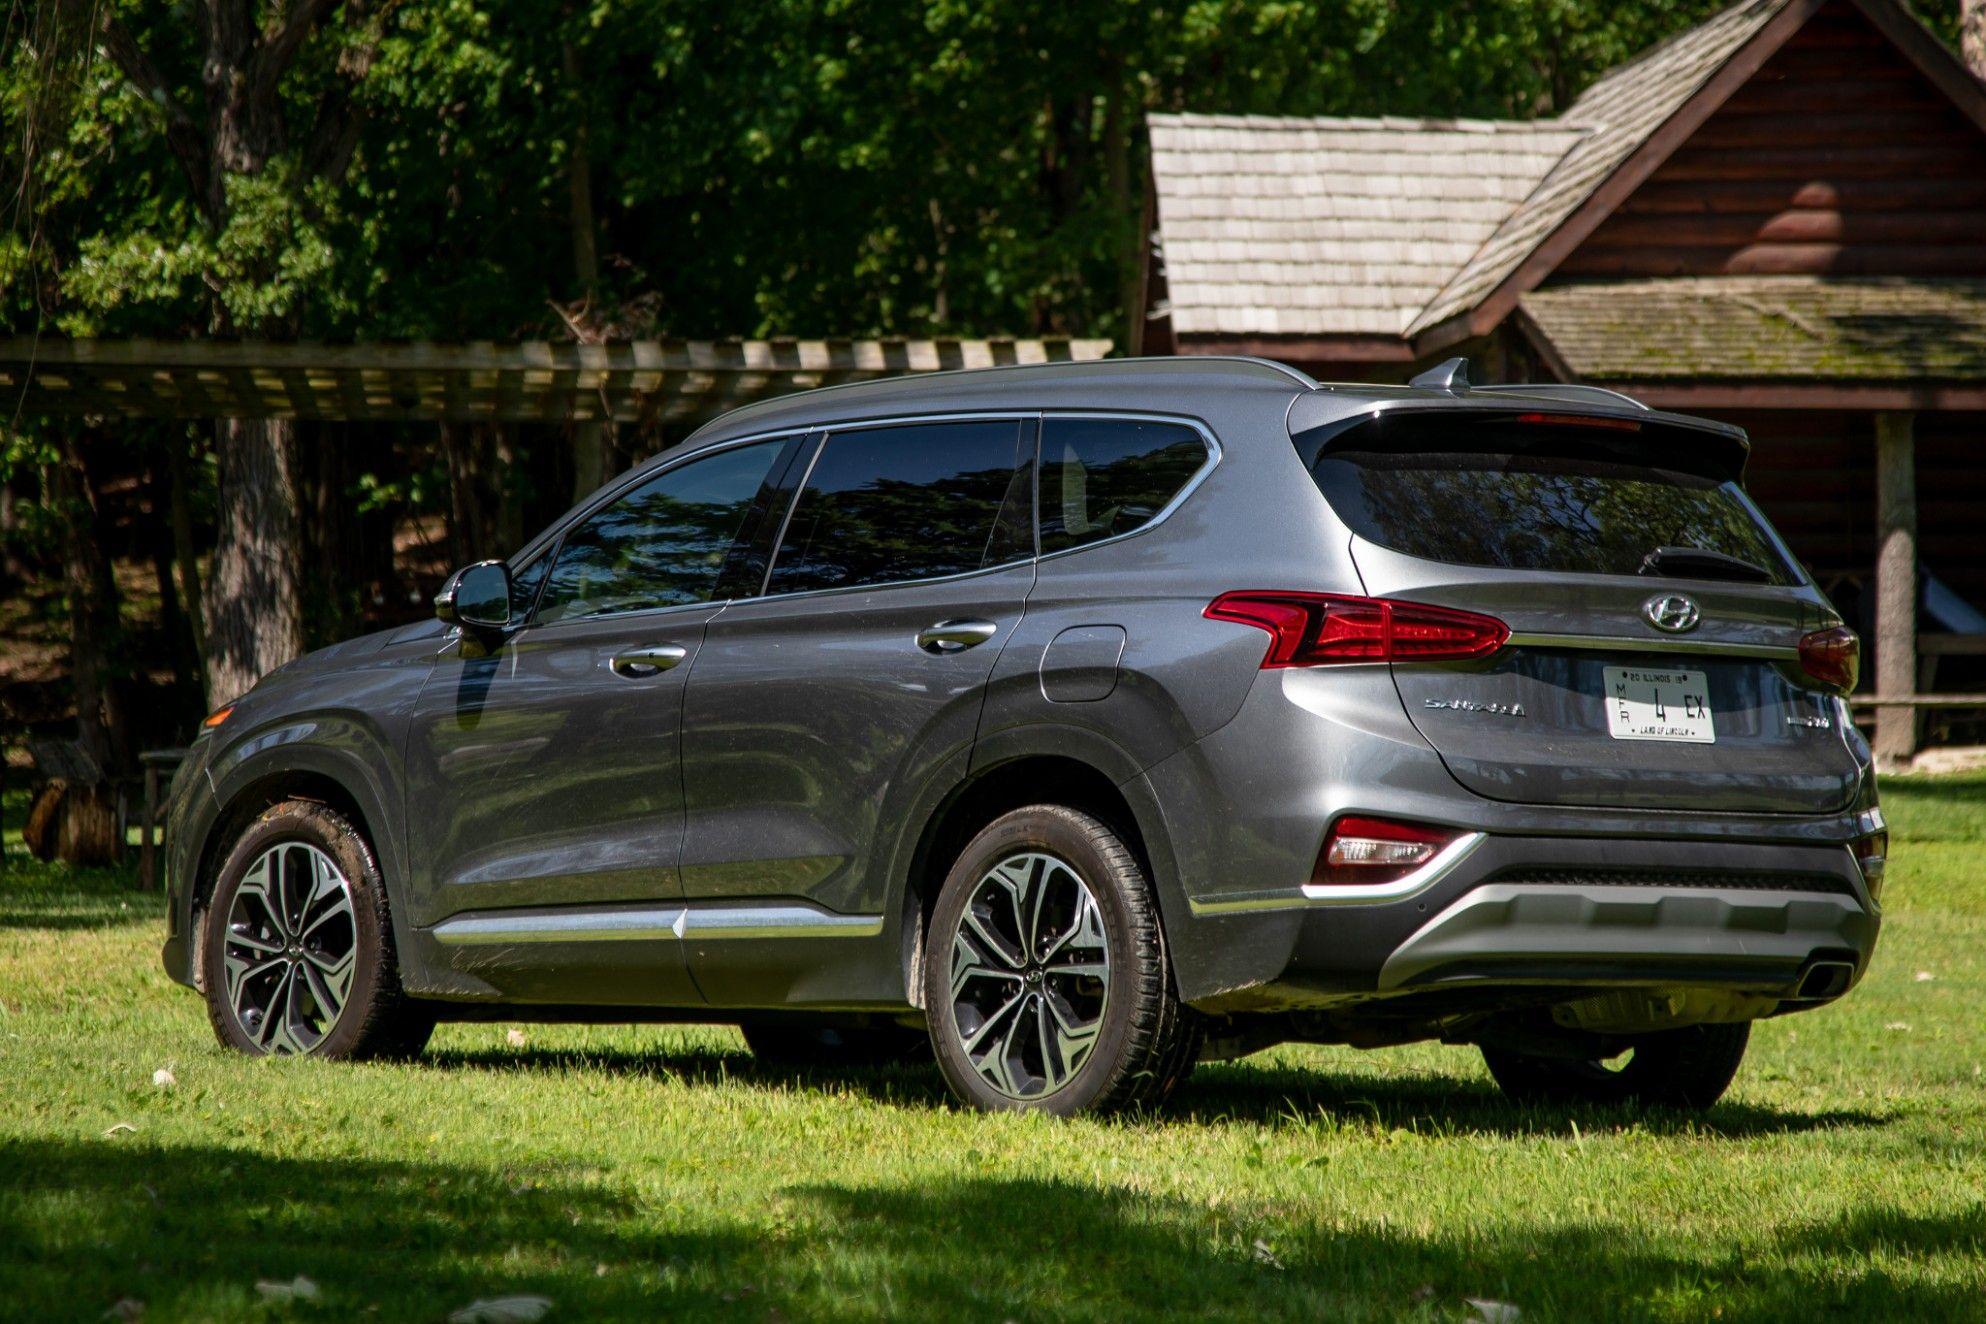 2020 Santa Fe Sports Style in 2020 Santa fe sport, Buick